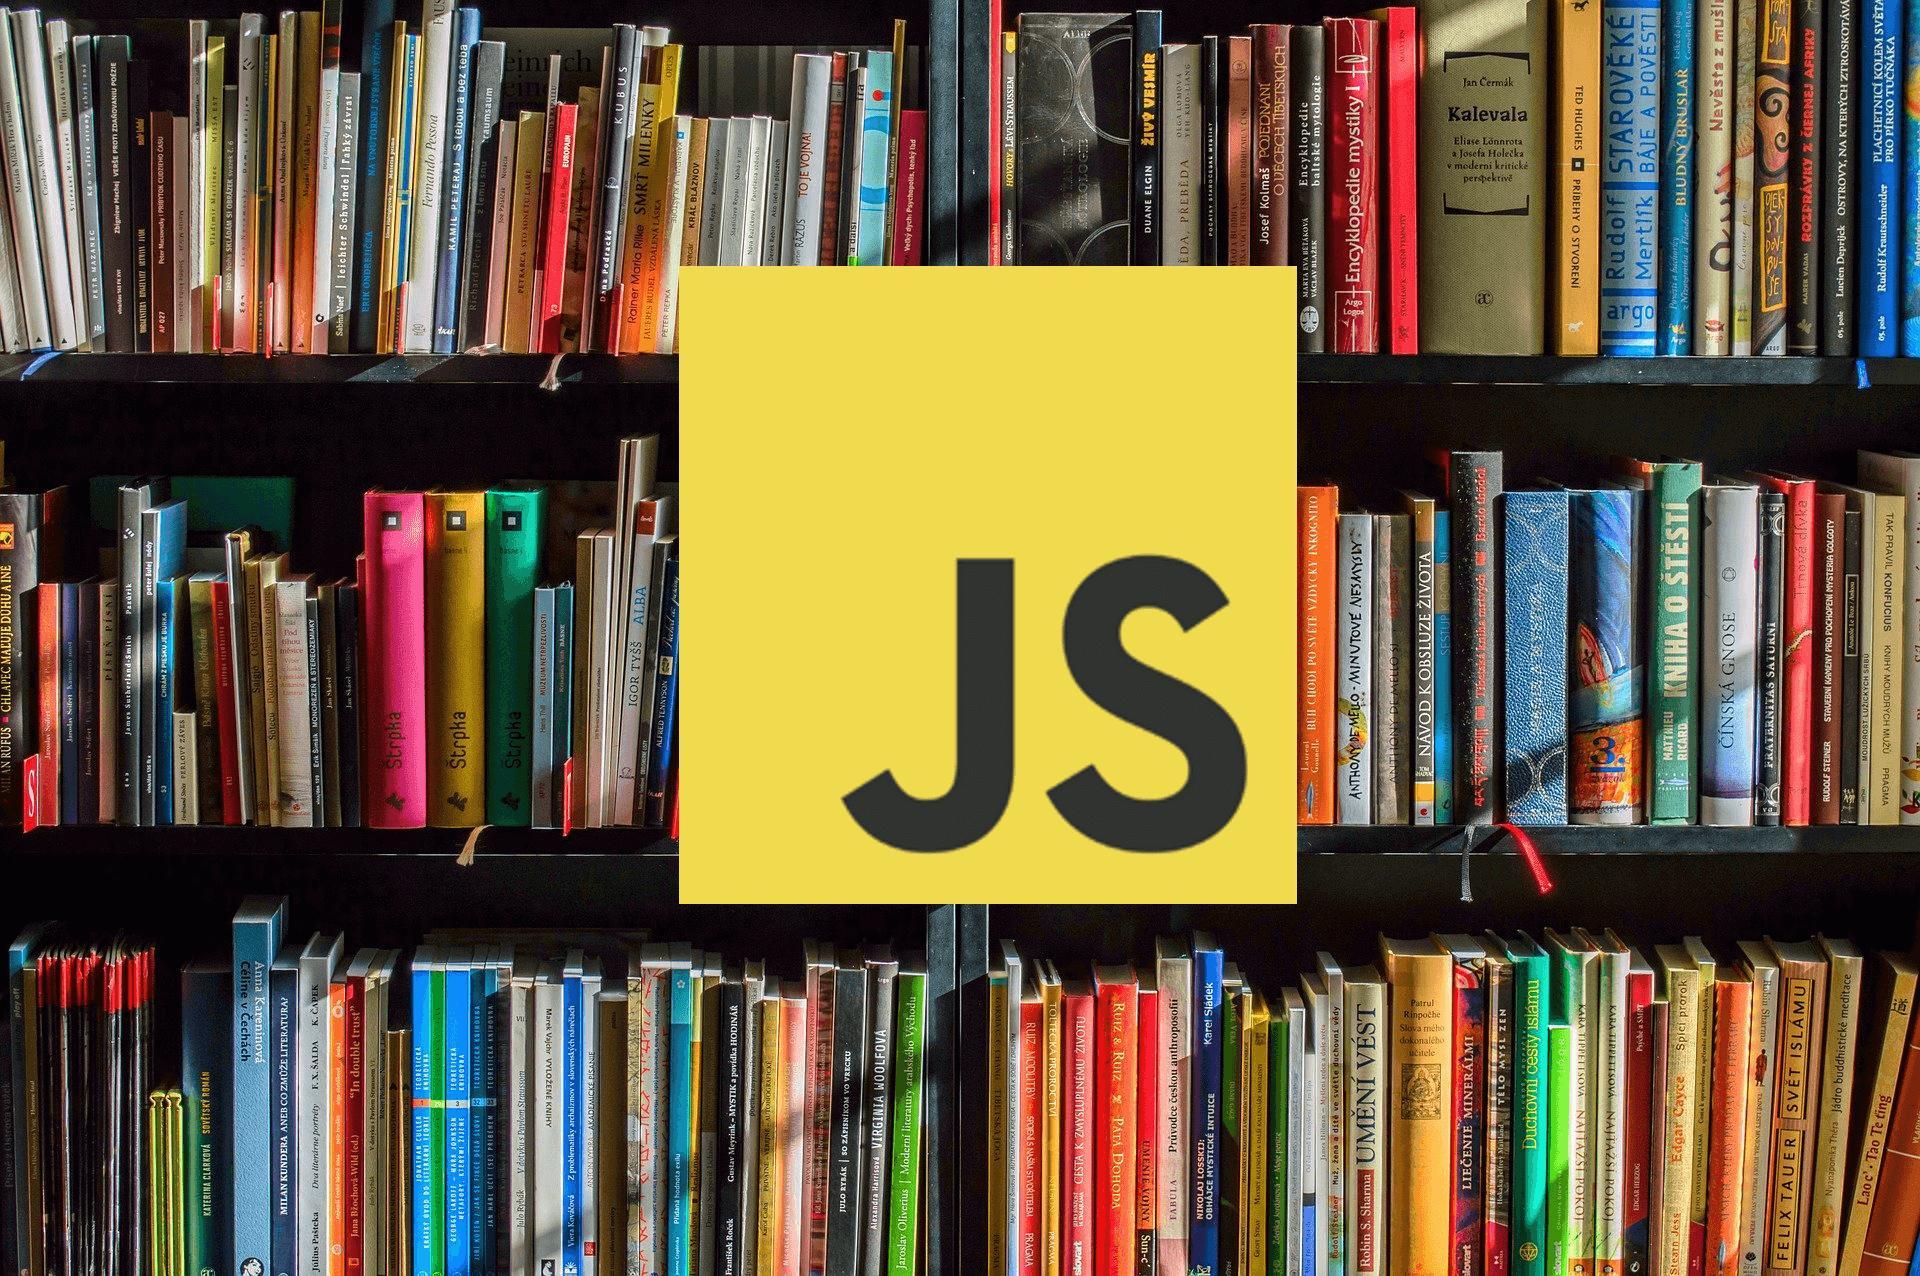 топ книг по javascript